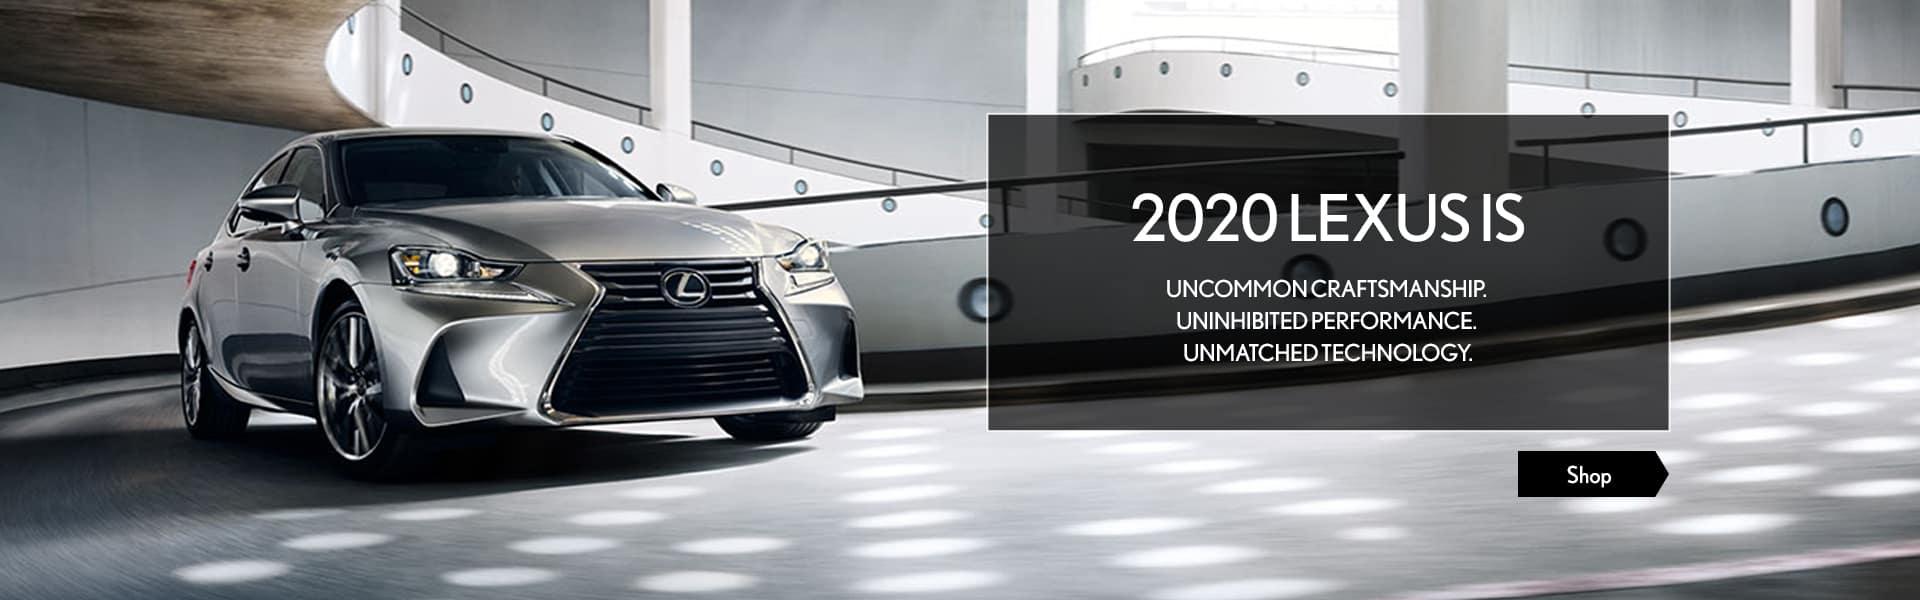 2020-Lexus-IS-Evergreen(1920x600) (2)